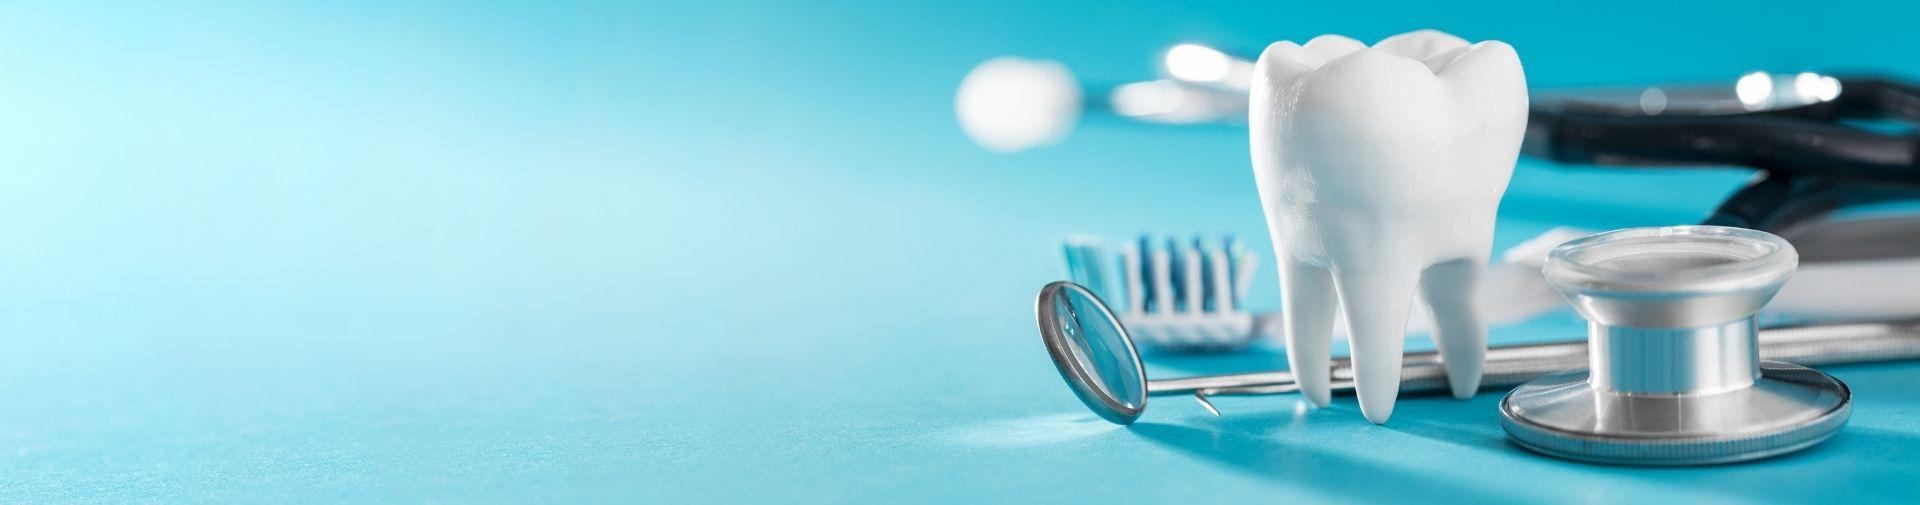 Dental Negligence Solicitors